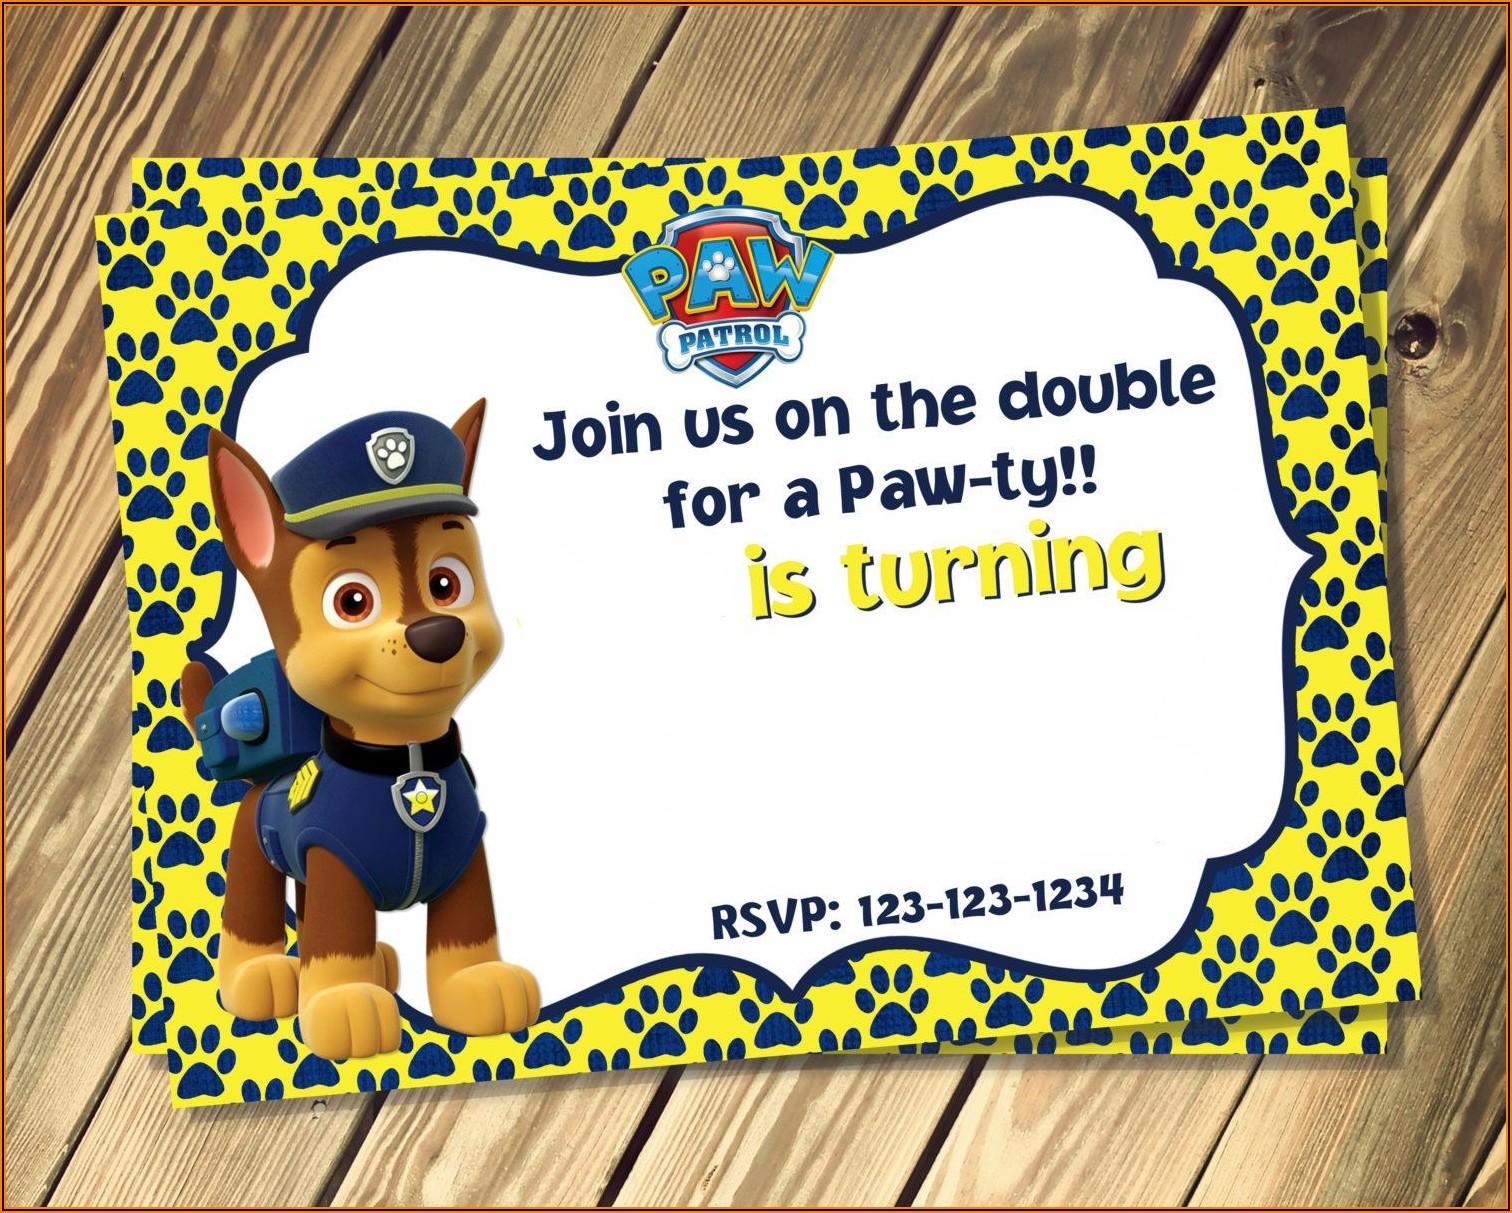 Paw Patrol Invitations Template Free